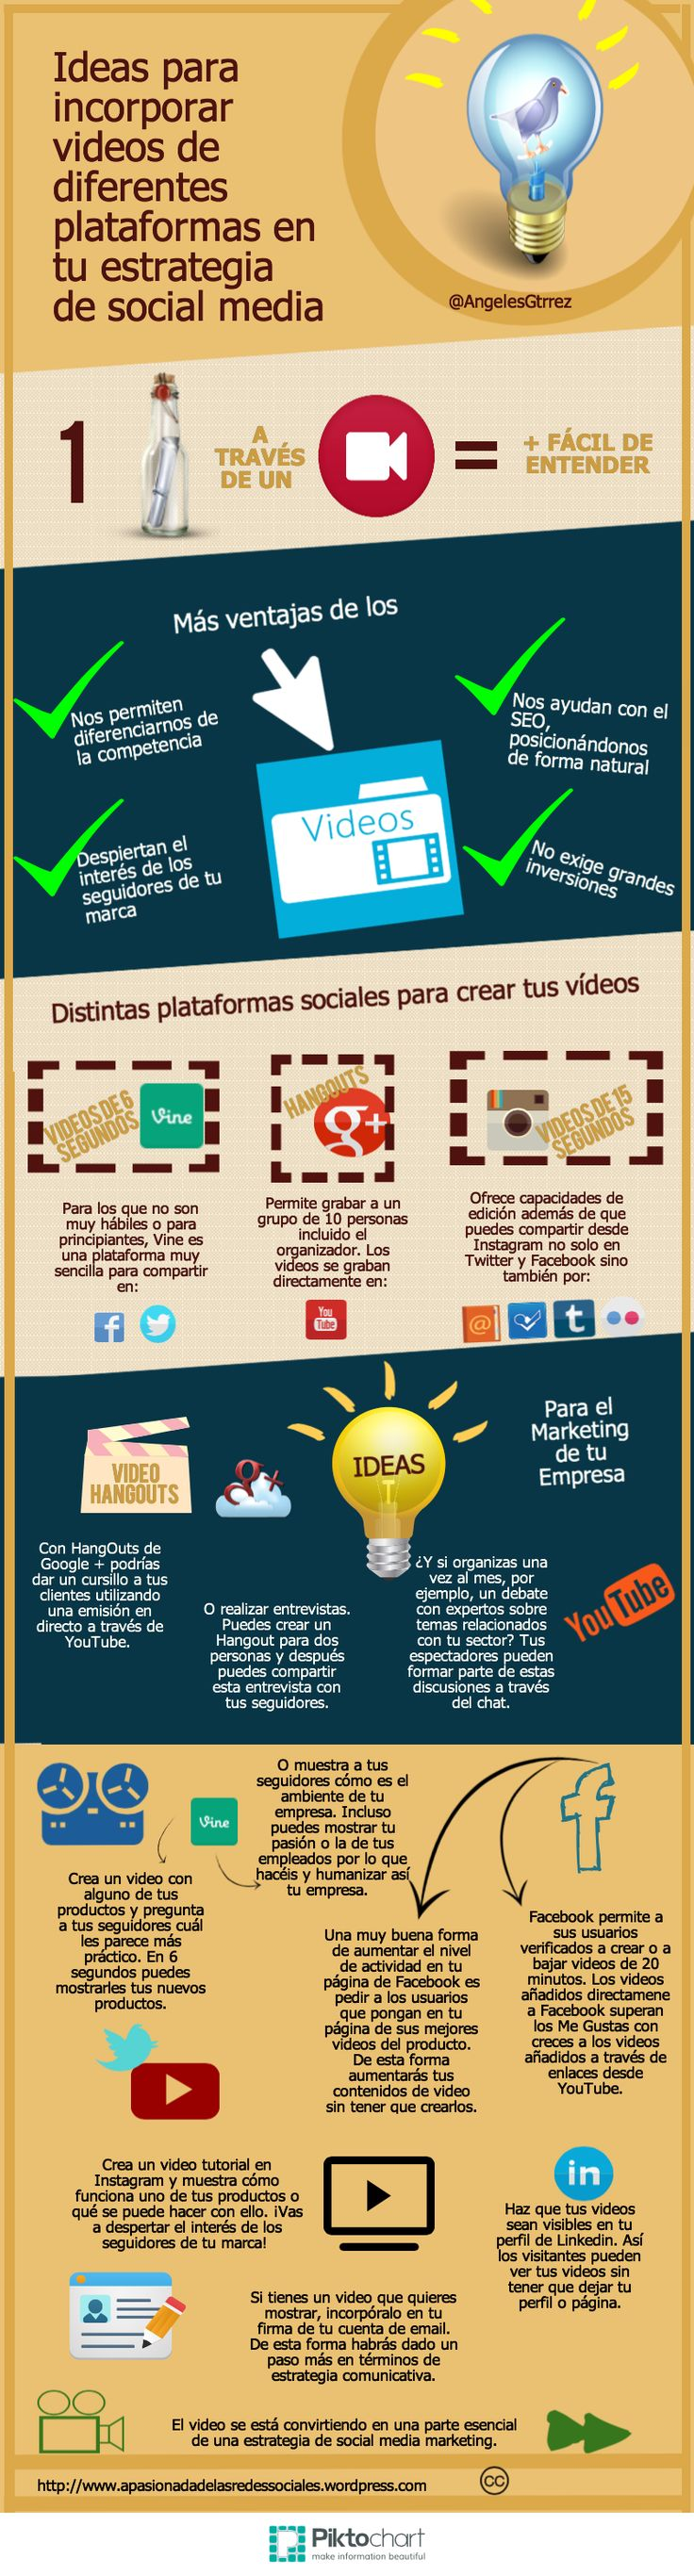 Ideas para usar vídeos de diferentes fuentes en Redes Sociales #infografia